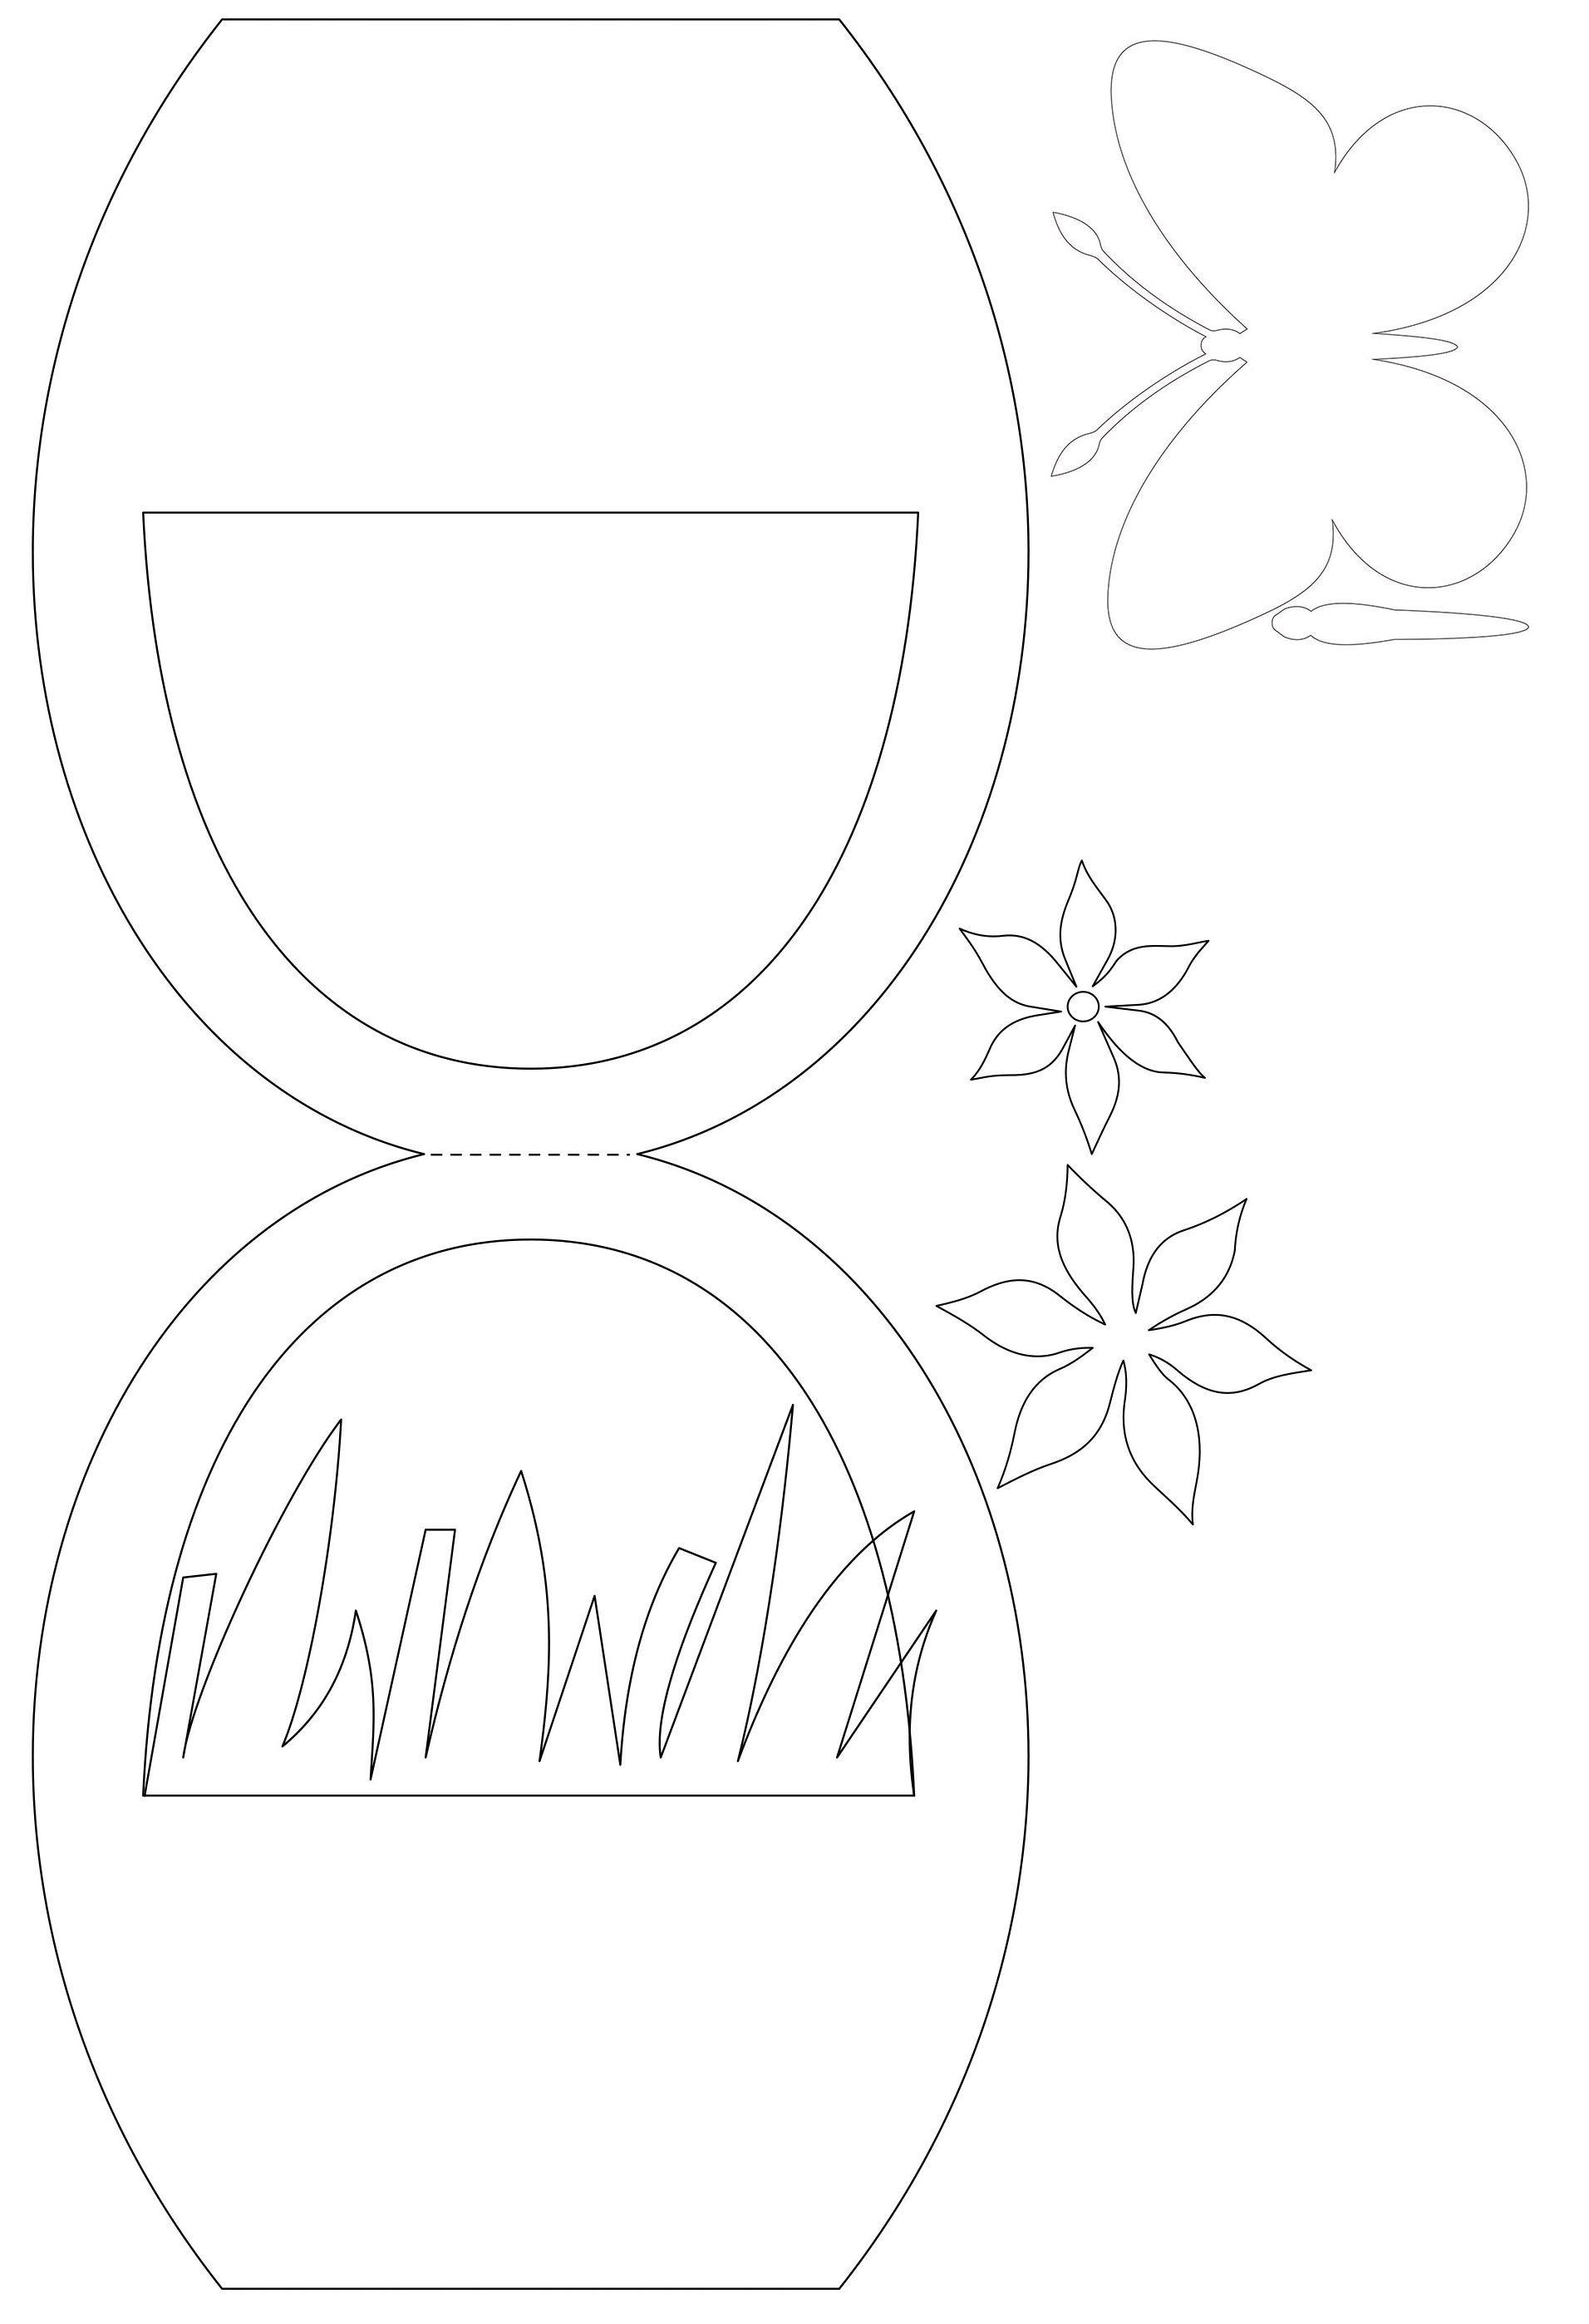 Betork Cavus Adli Kullanicinin Origami Panosundaki Pin Boyama